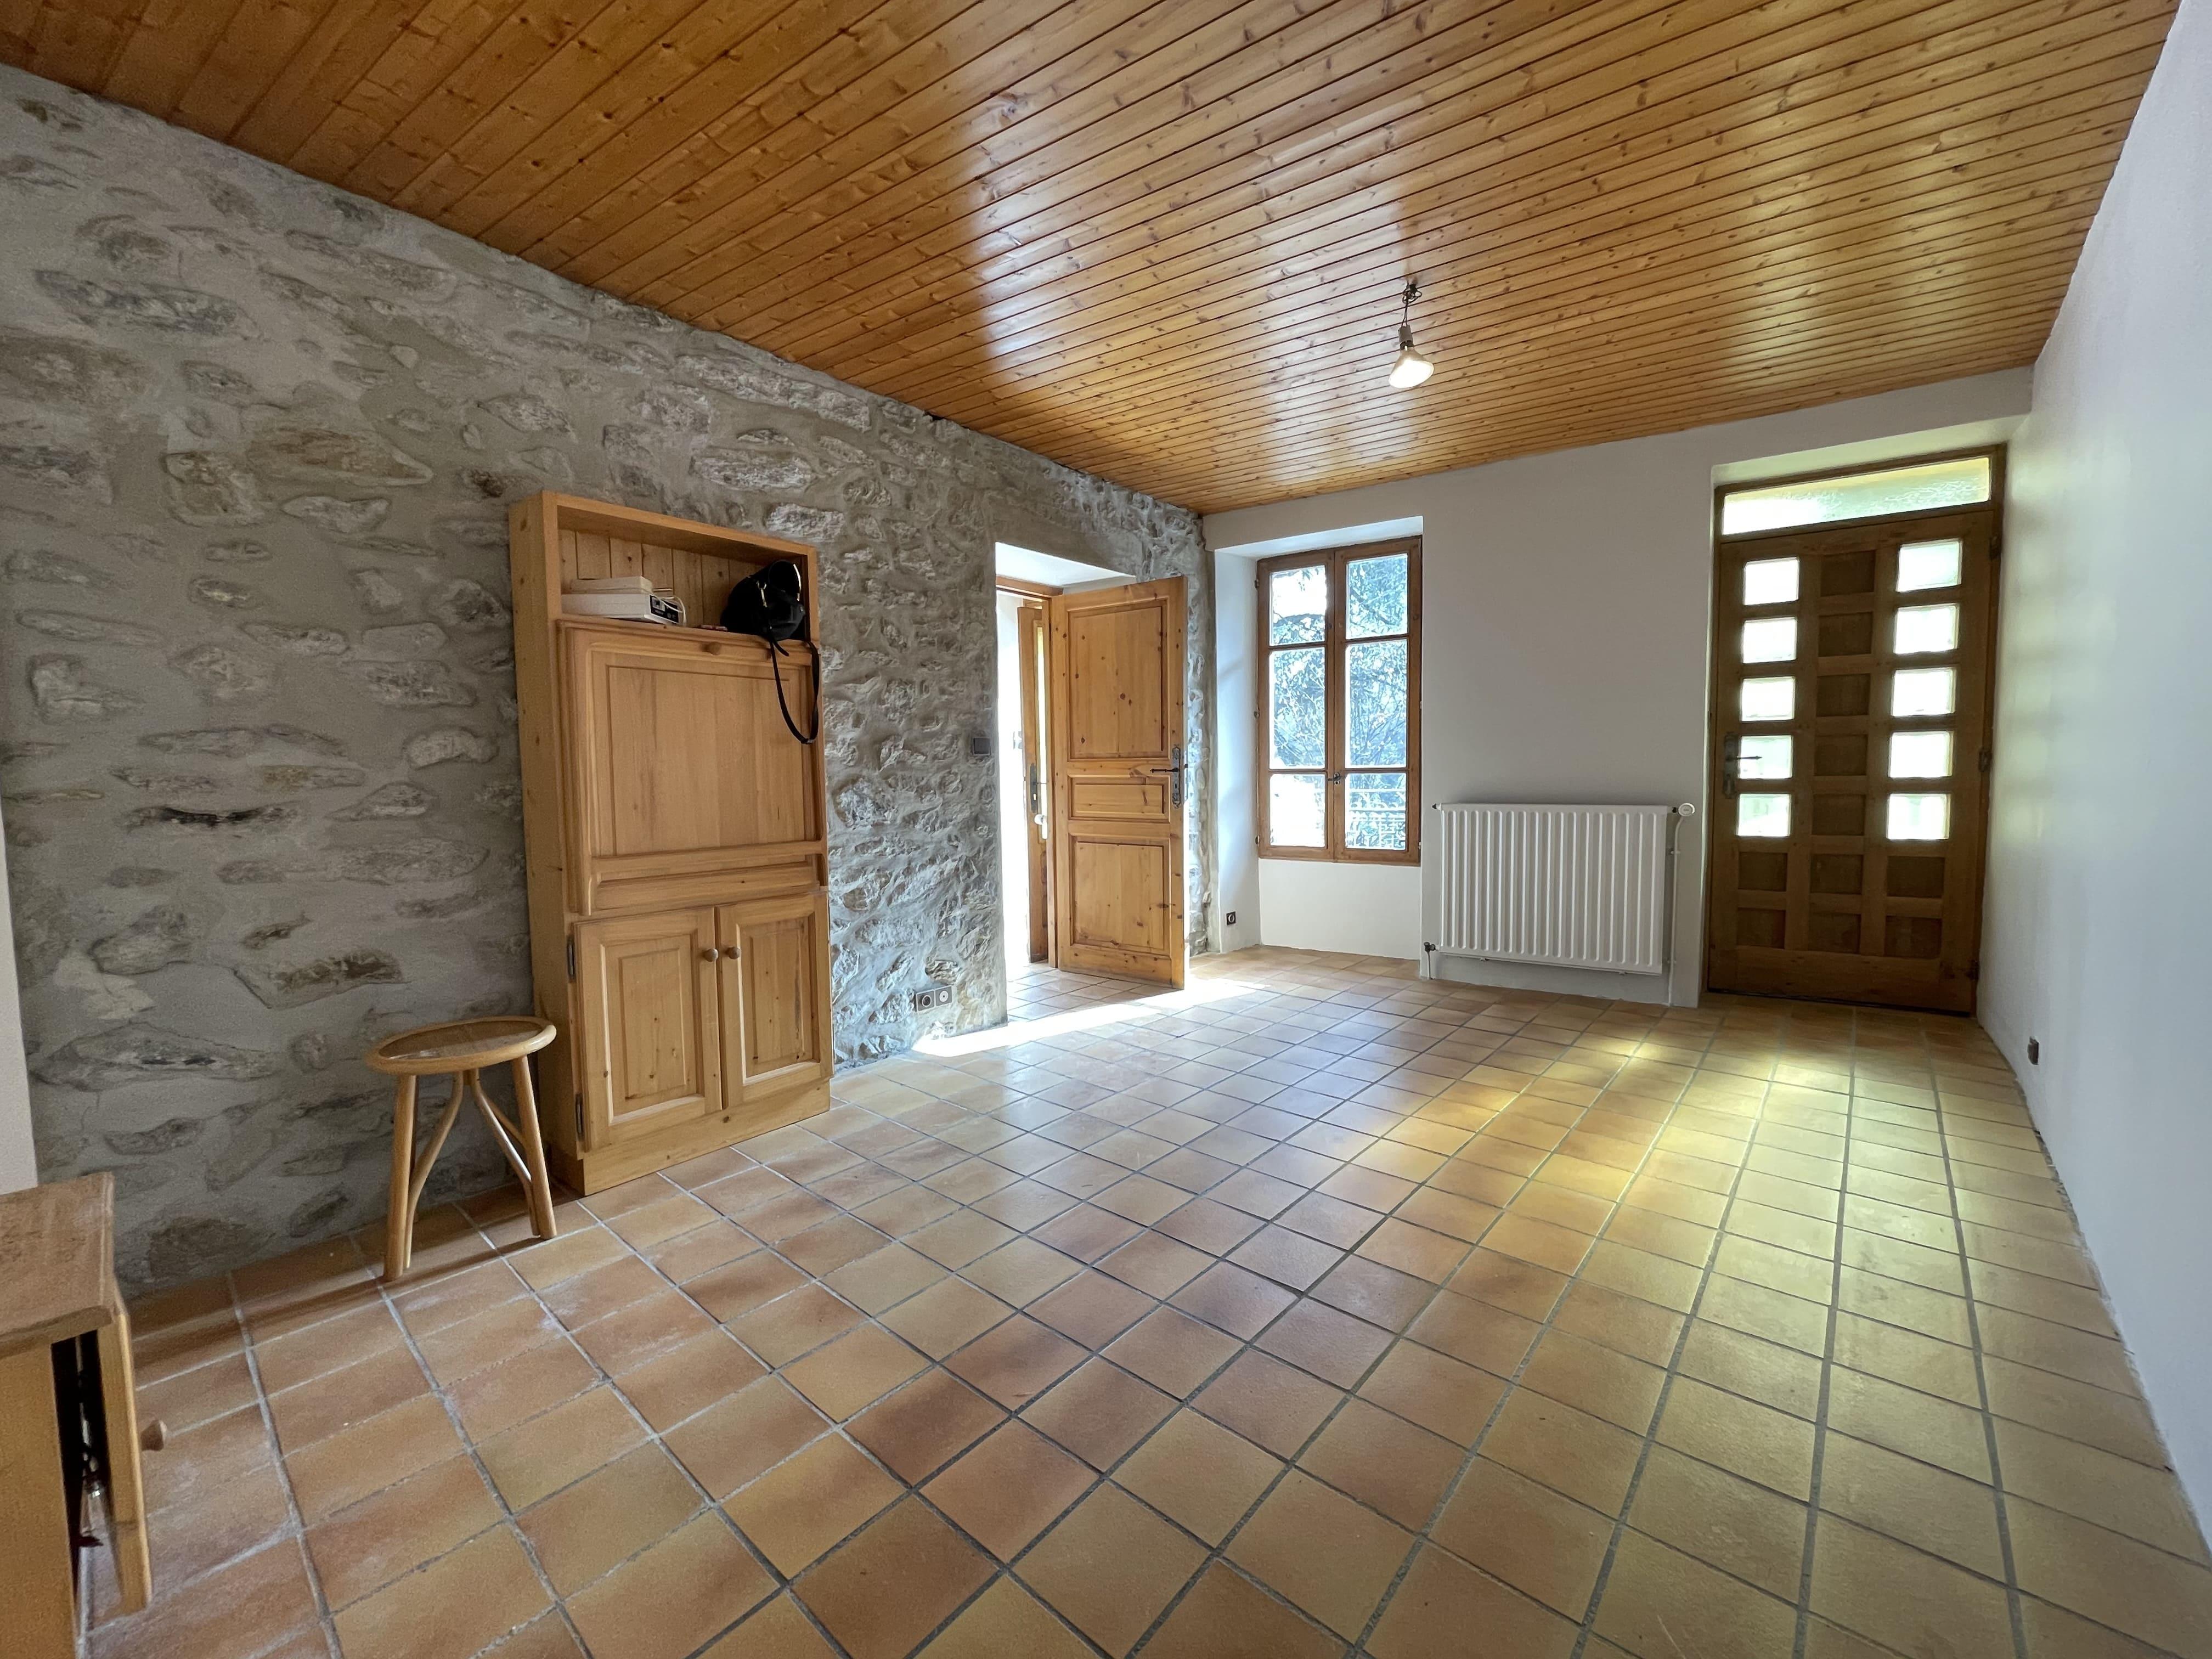 5-room house 147 m²